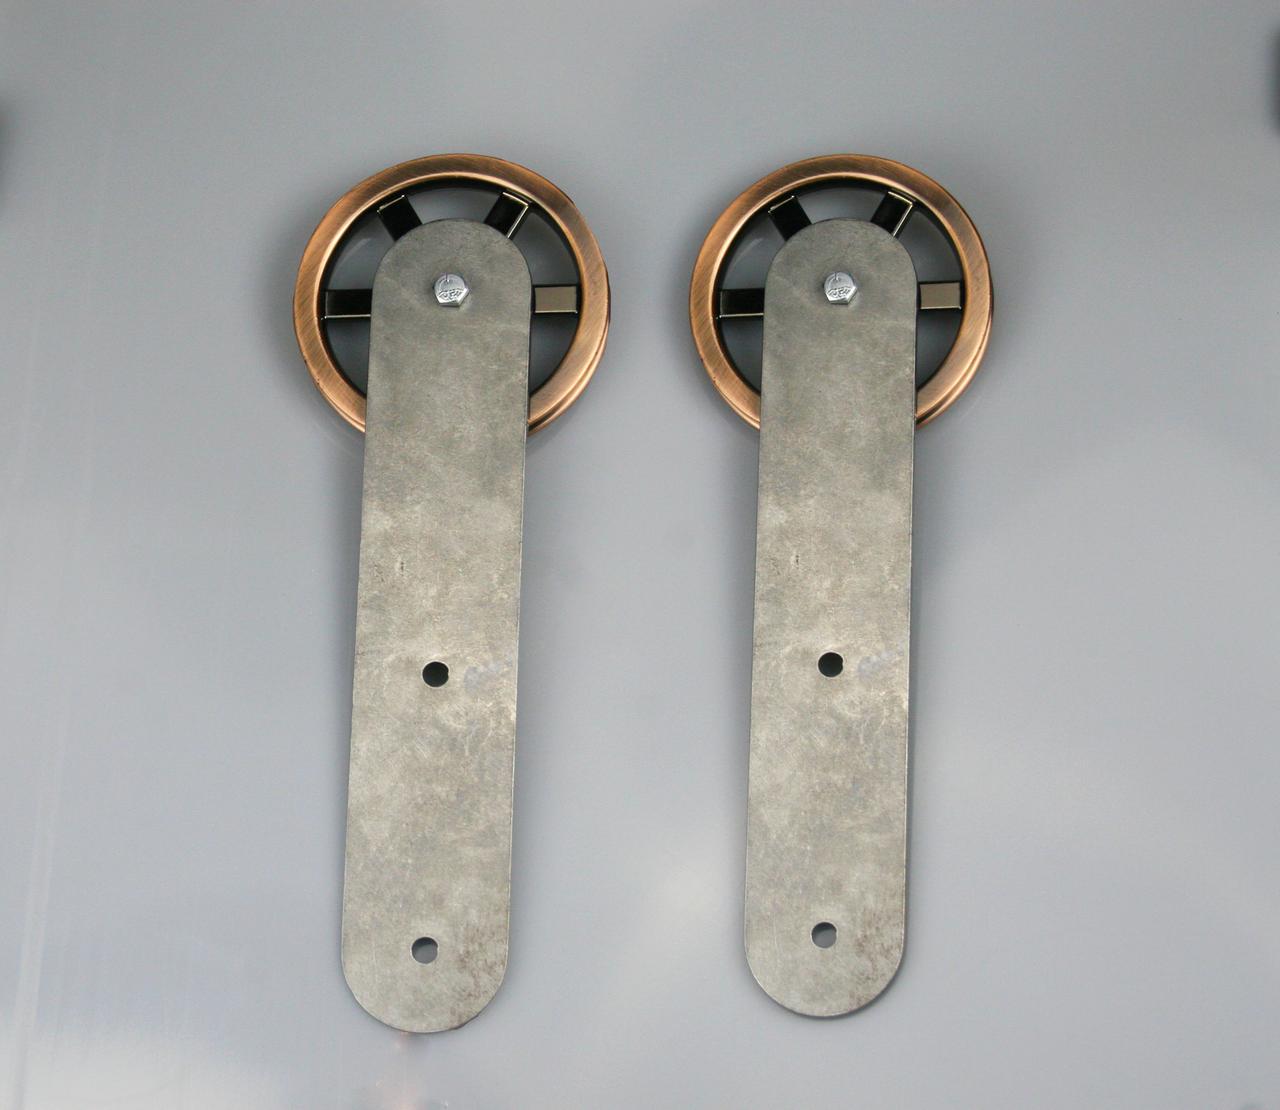 Copper Jumbo Wheel Barn Door Hardware Kit Barn Door Hardware Doors Mini Barn Door Hardware